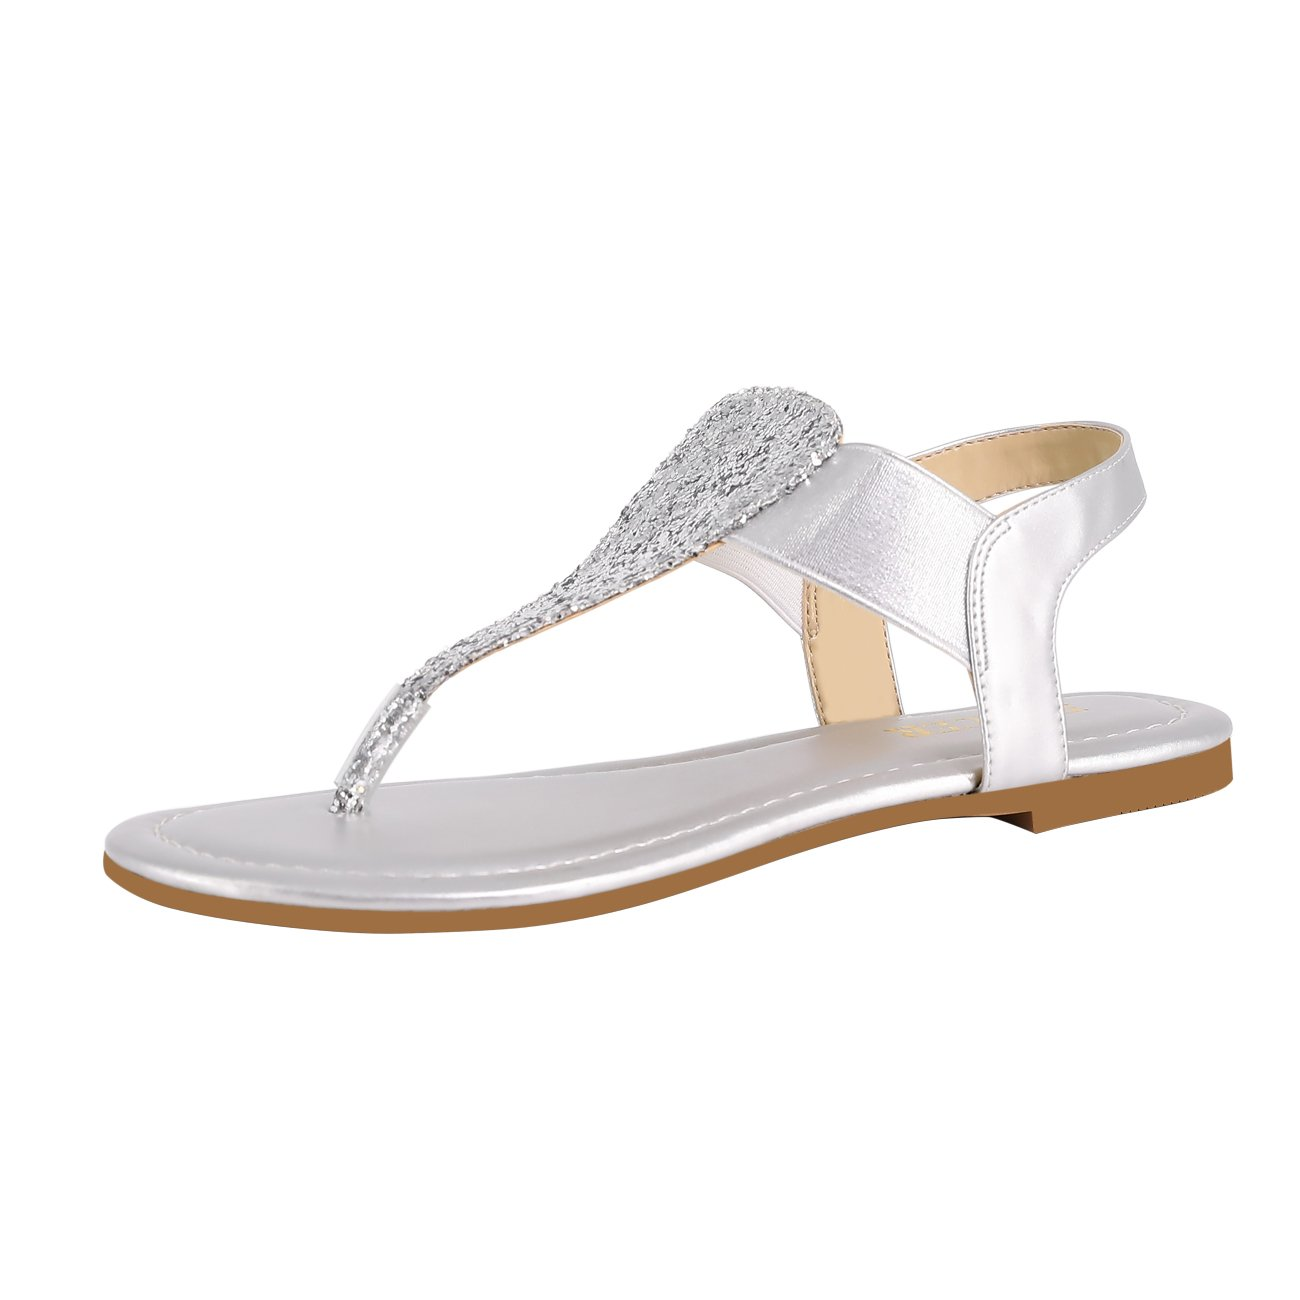 Eunicer Women's Sparkling Thong Elastic Strap Summer Flat Sandals